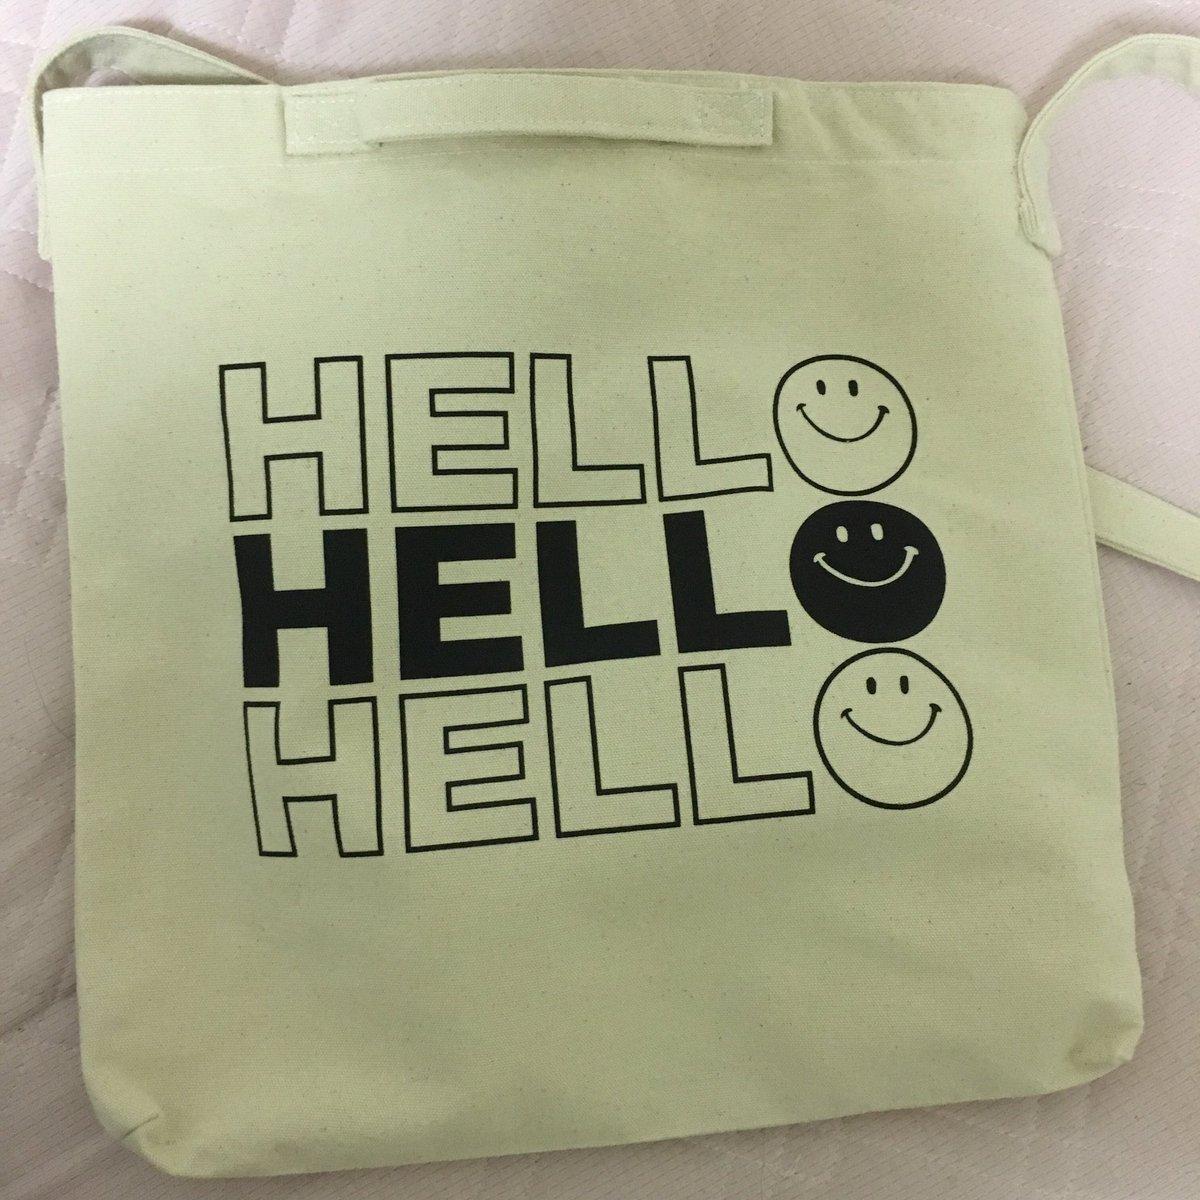 RT @gotouhakichi: このバッグ見た時、 「地獄🙂     地獄🙂    ...